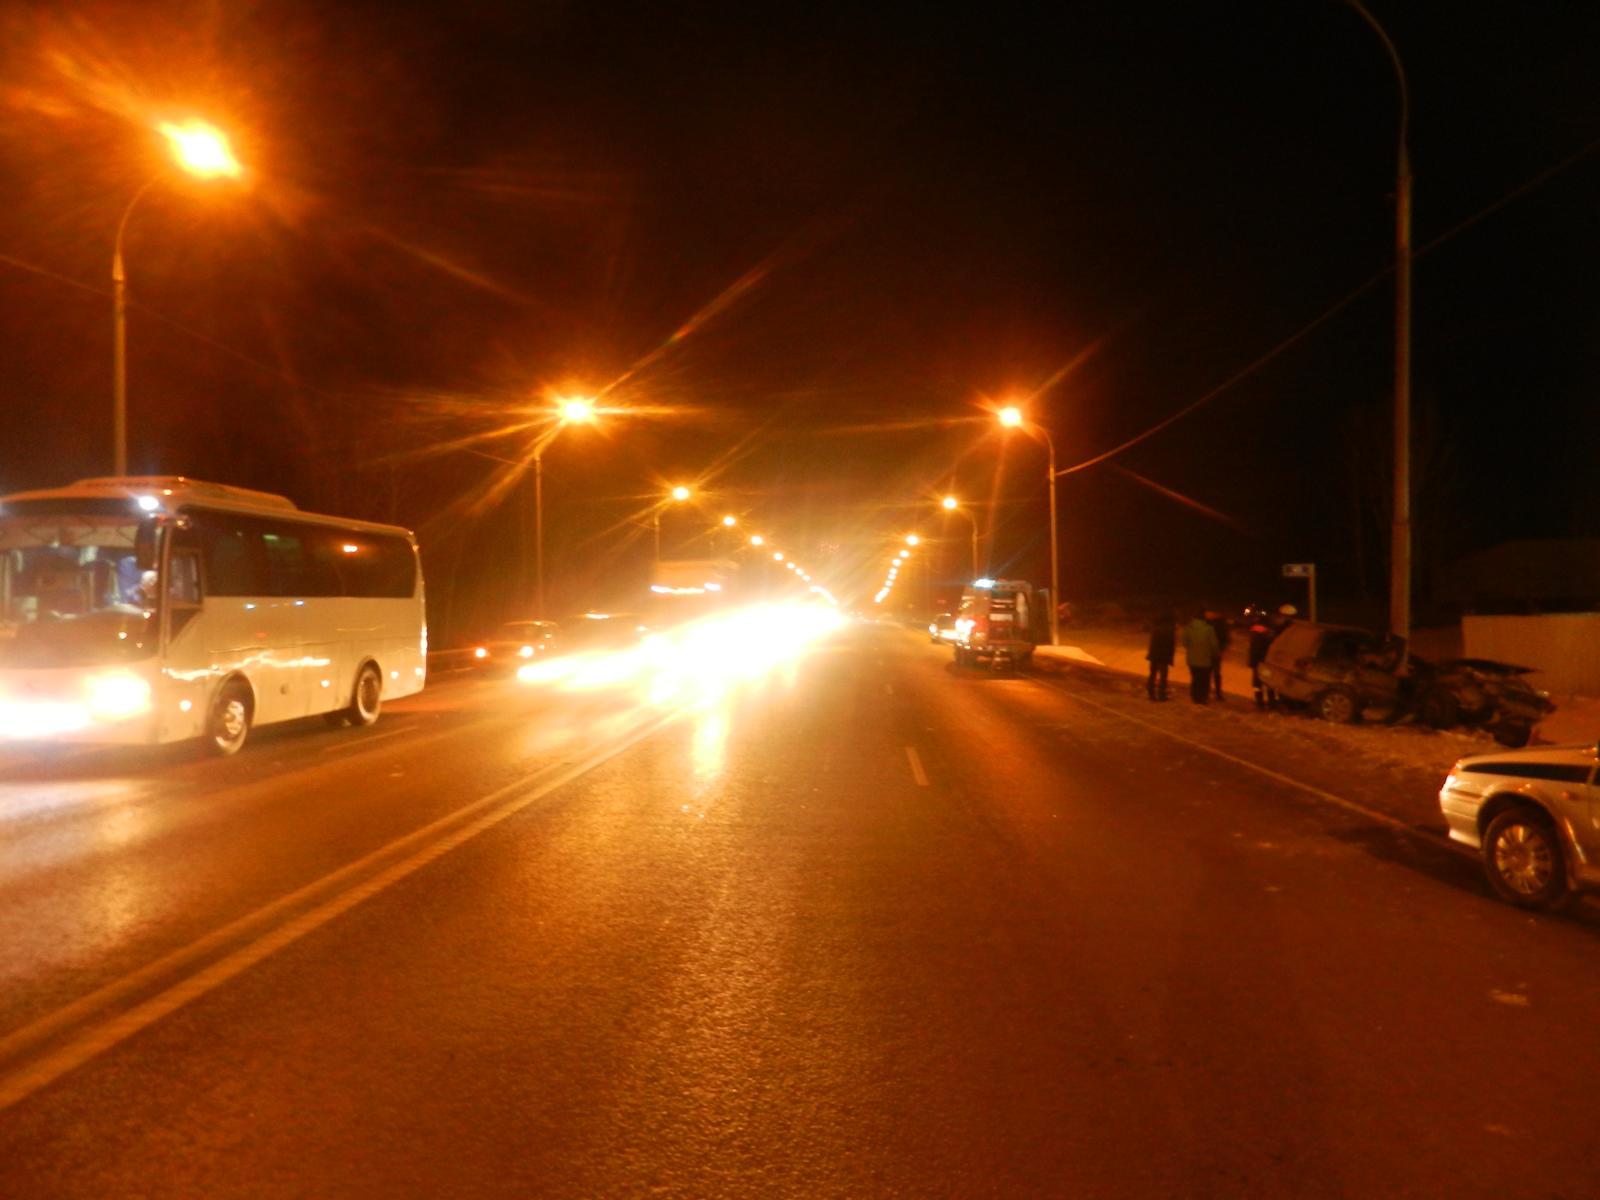 ДТП произошло на 40-м километре Чуйского тракта